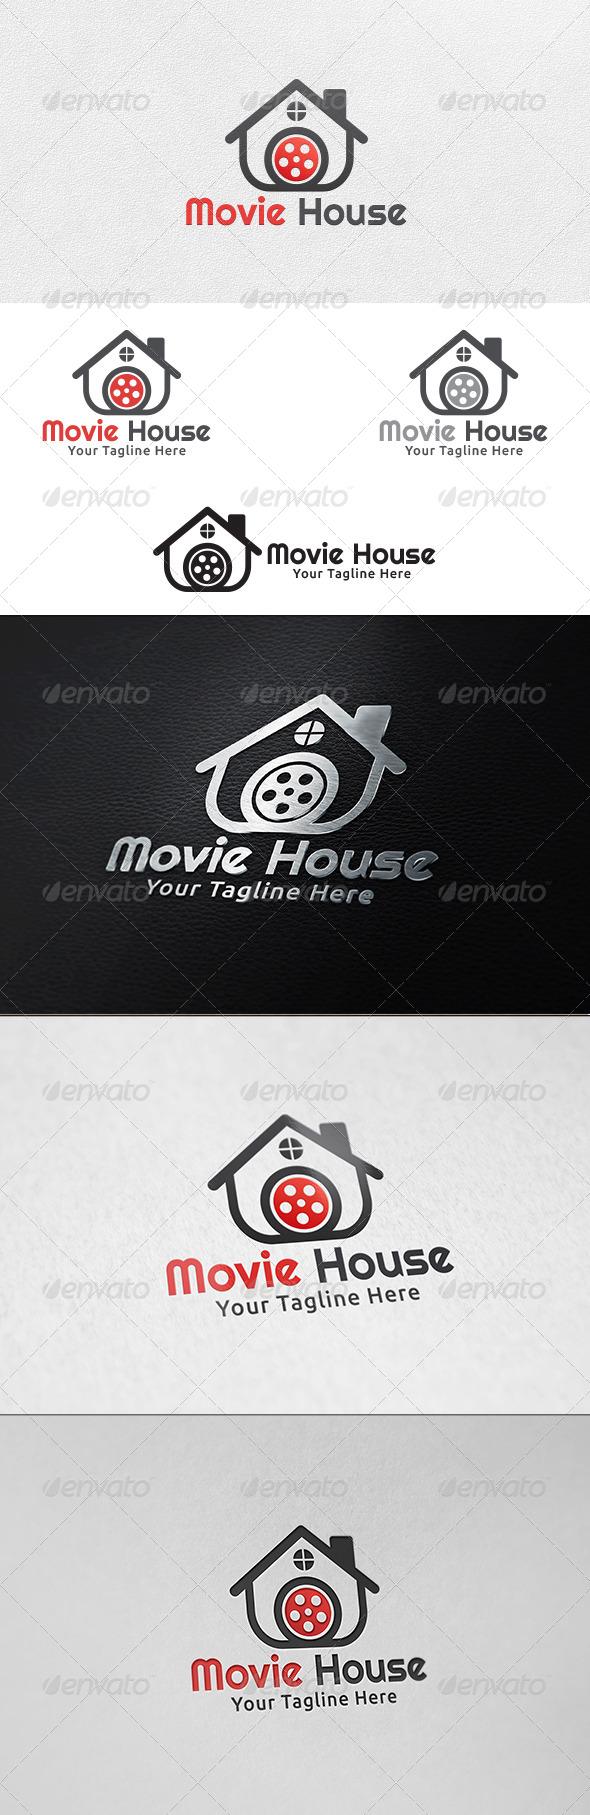 Movie House - Logo Template